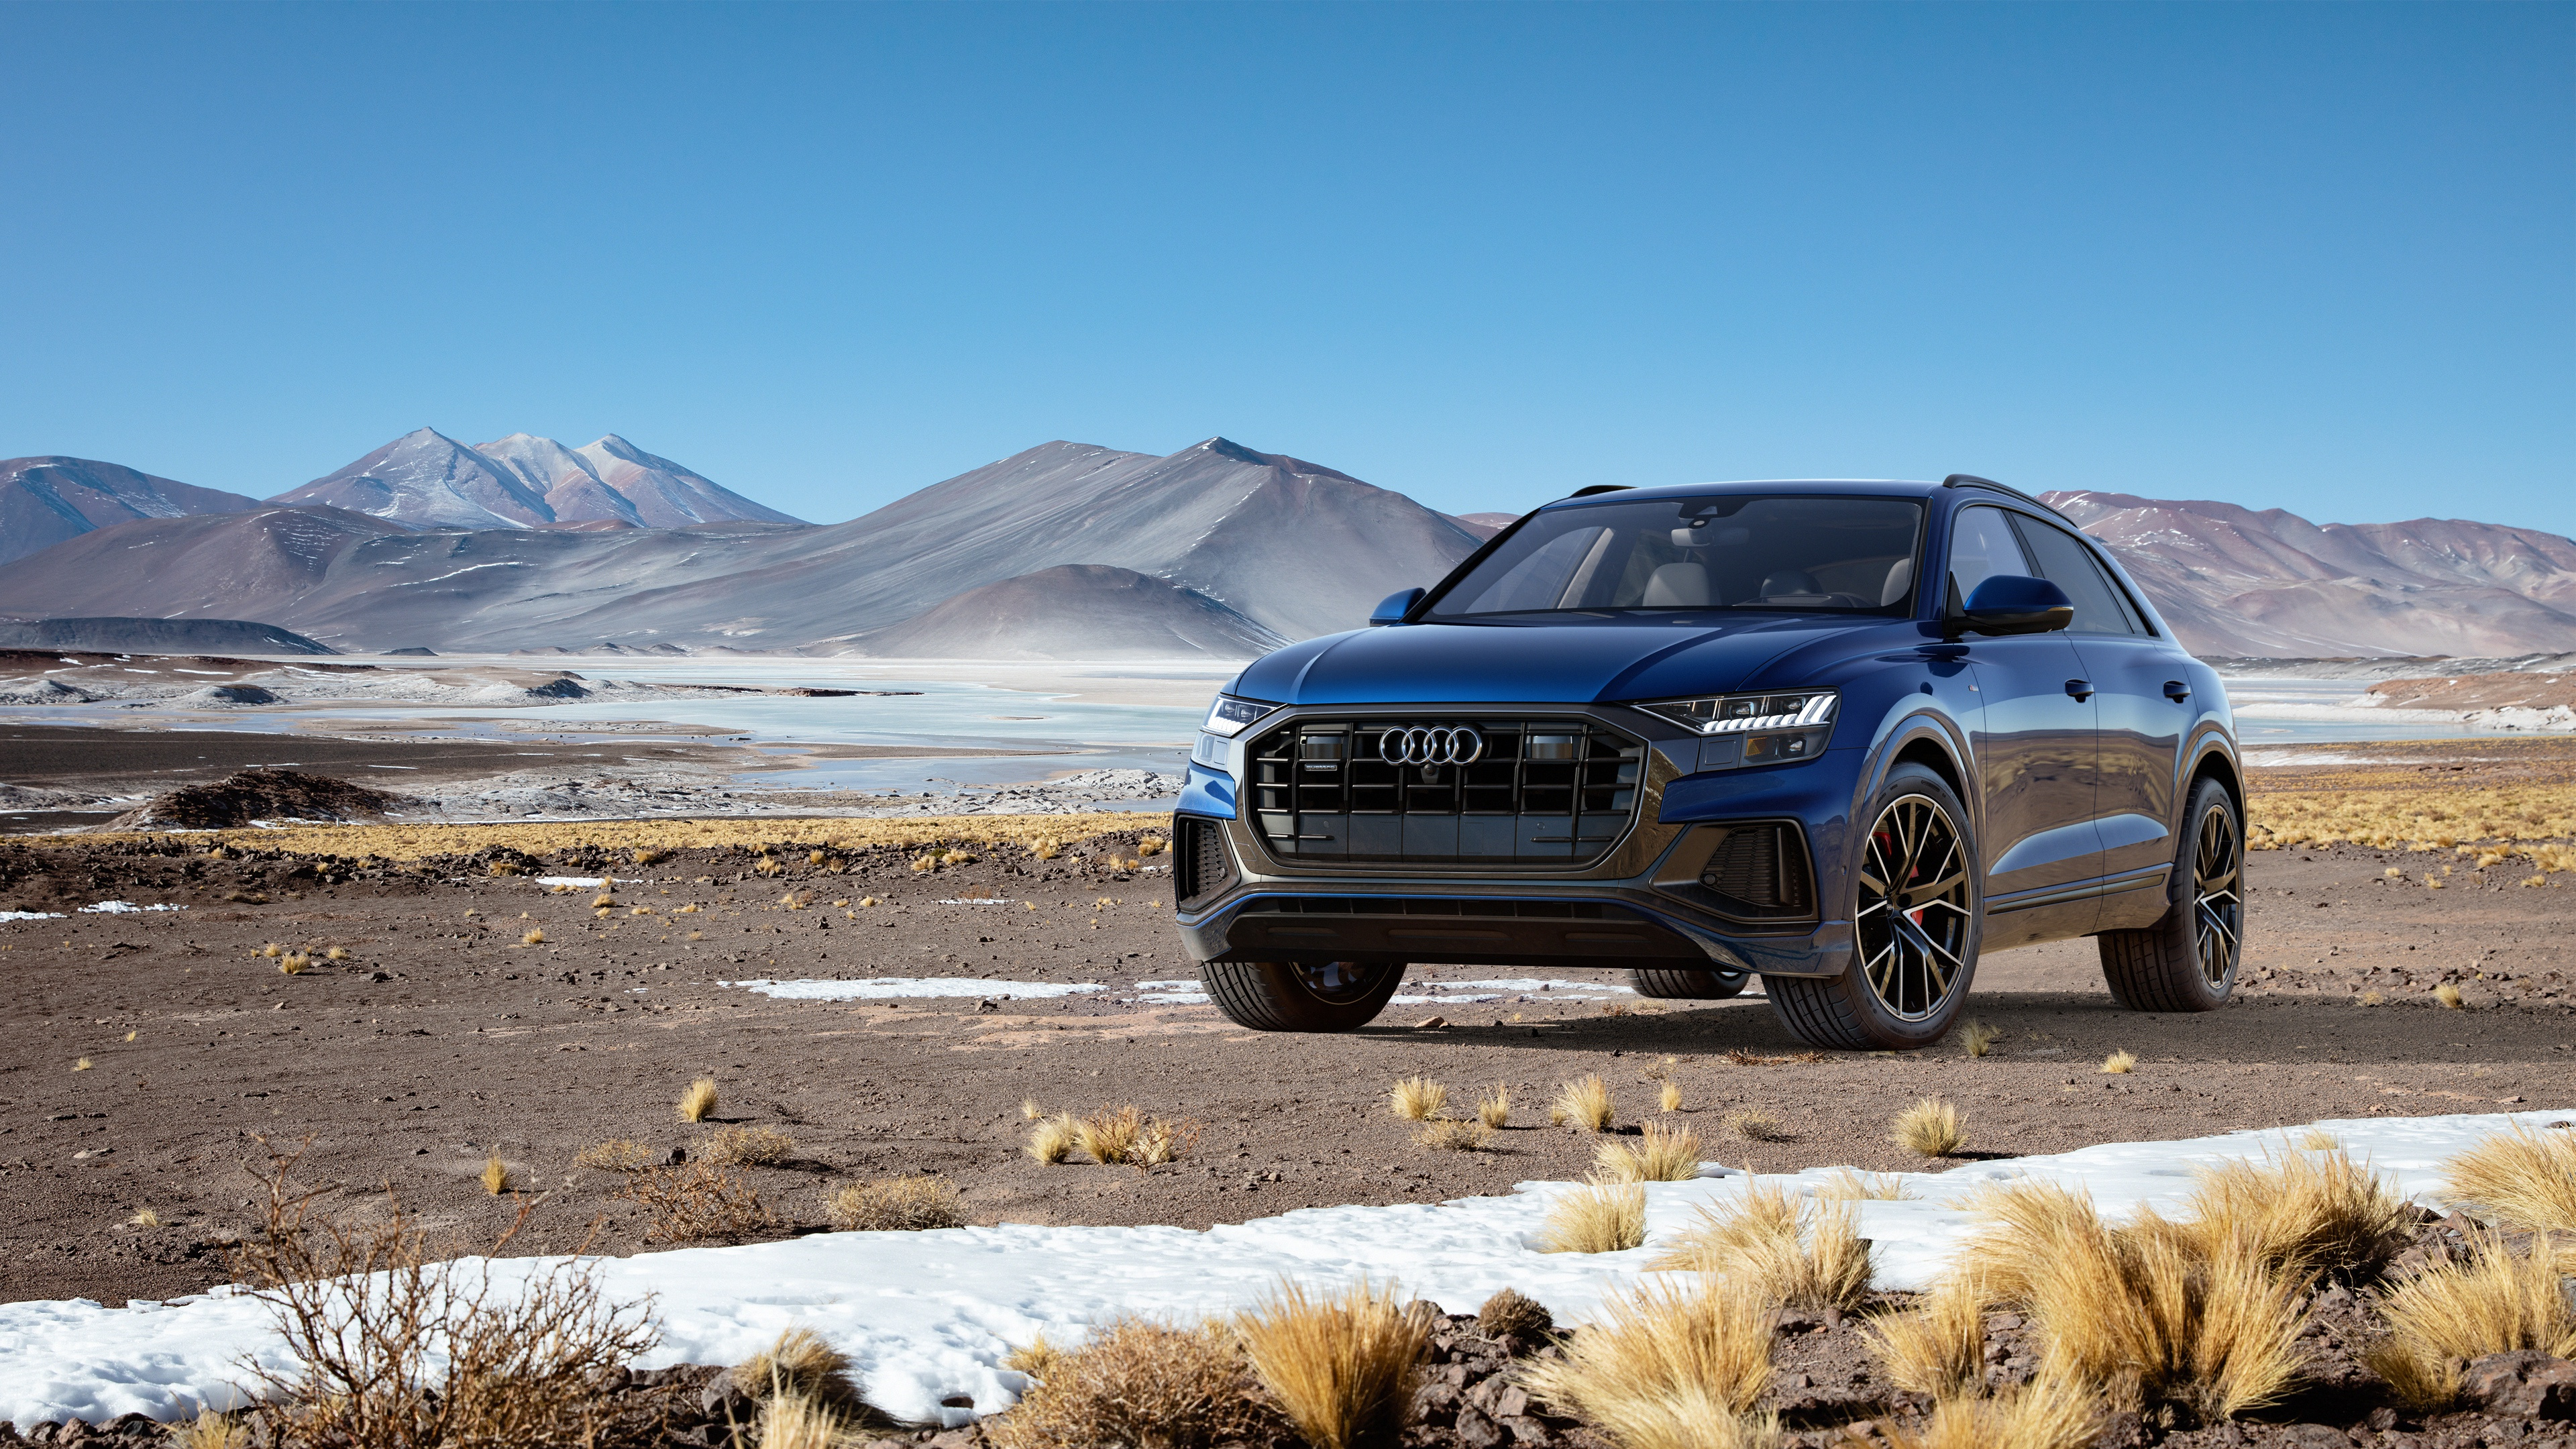 Audi Q8 4k Ultra HD Wallpaper   Background Image ...